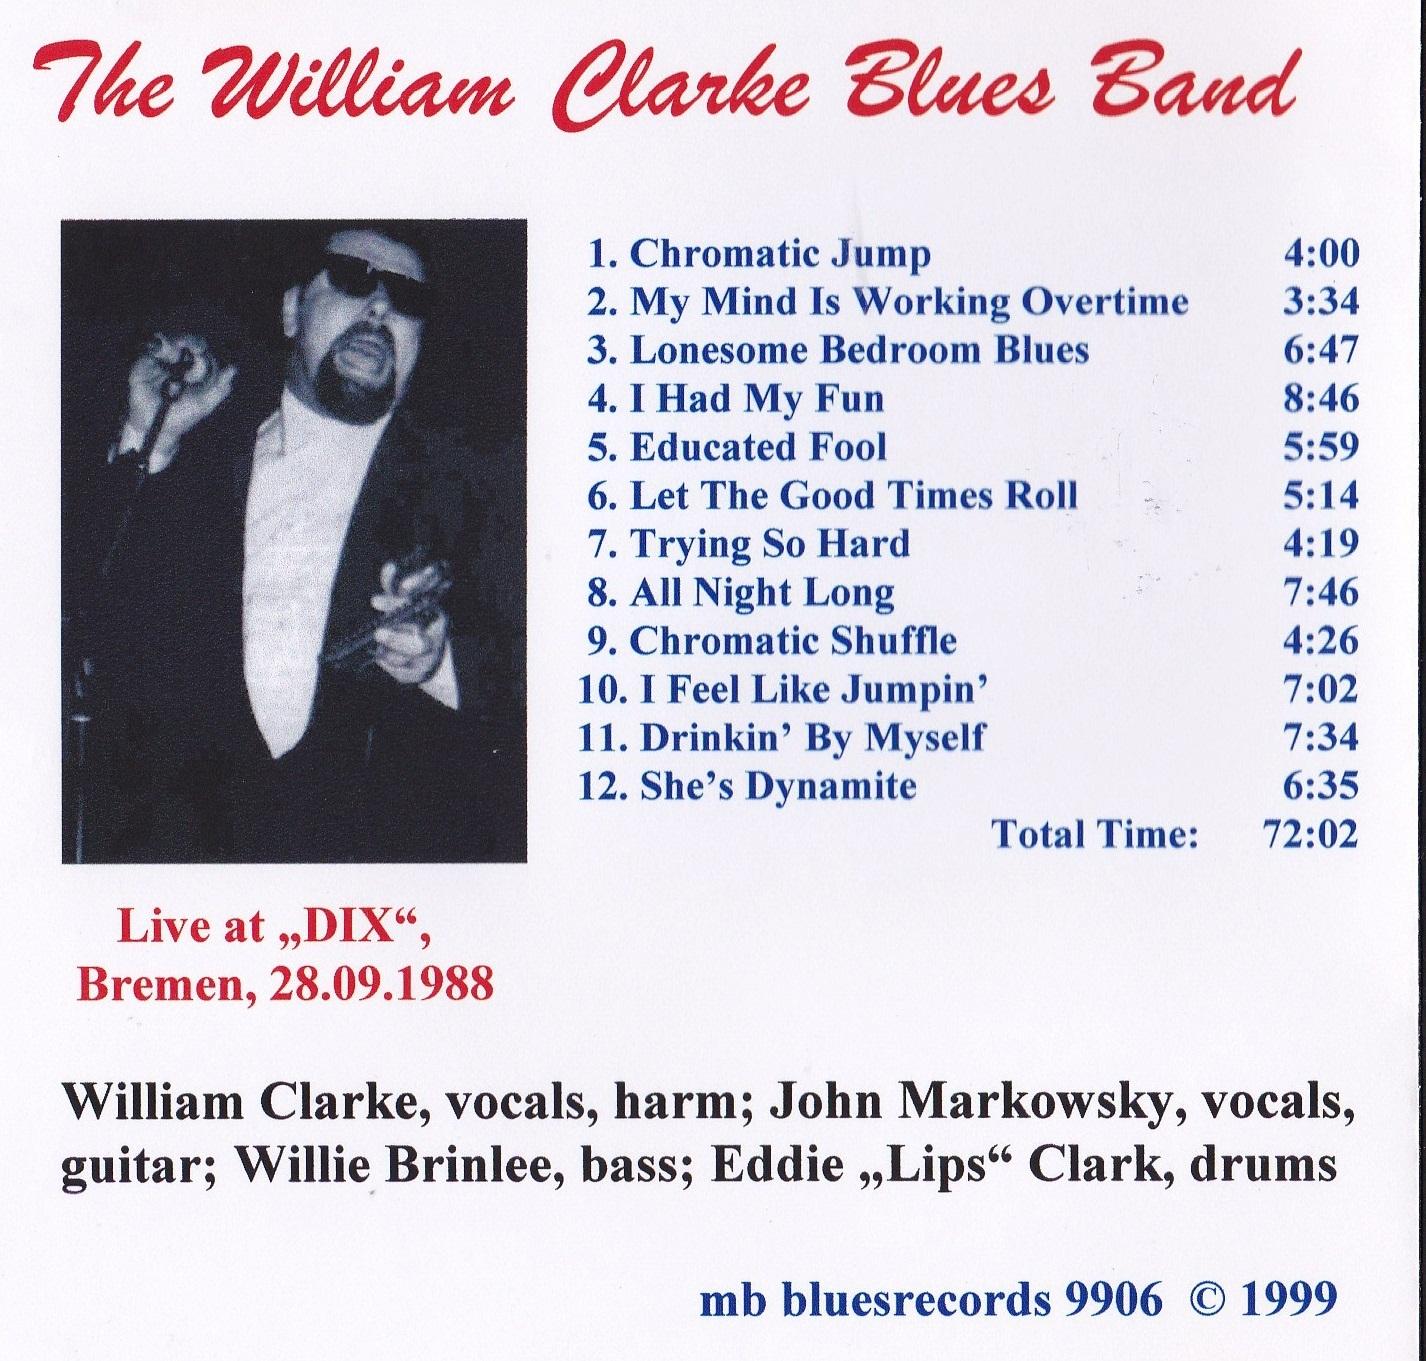 Soundaboard: William Clarke Blowin' my Harp 1998